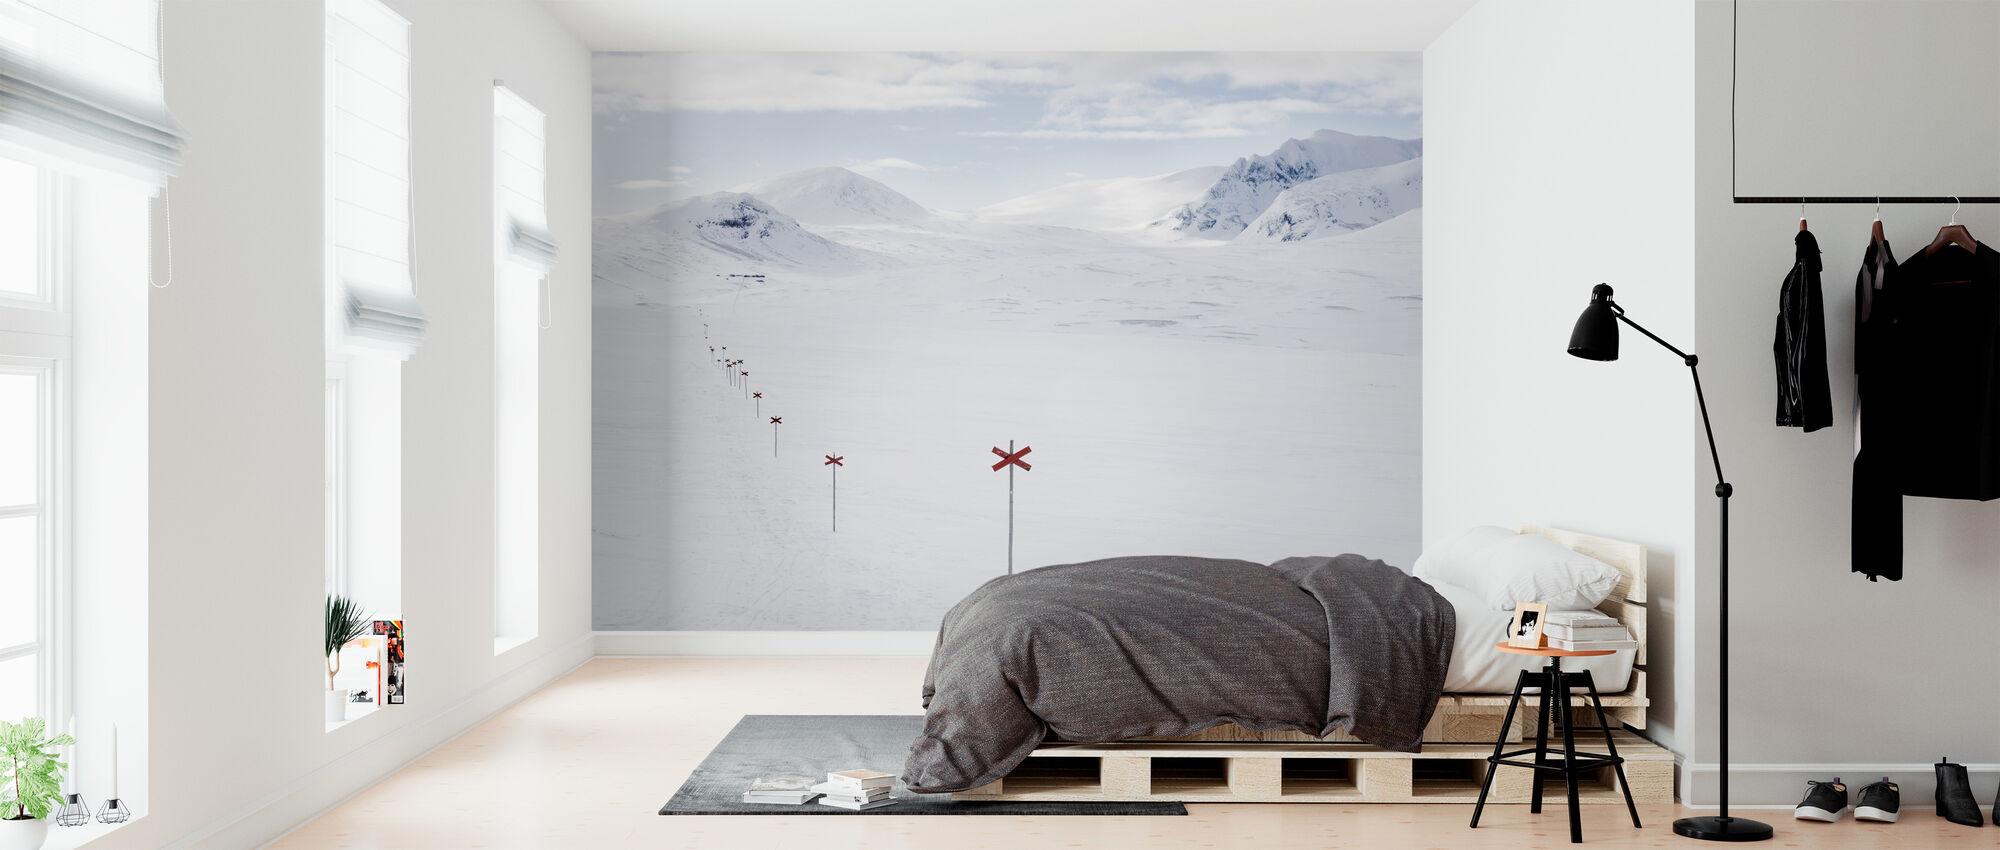 Hiking Trail in Sylarna, Sweden - Wallpaper - Bedroom